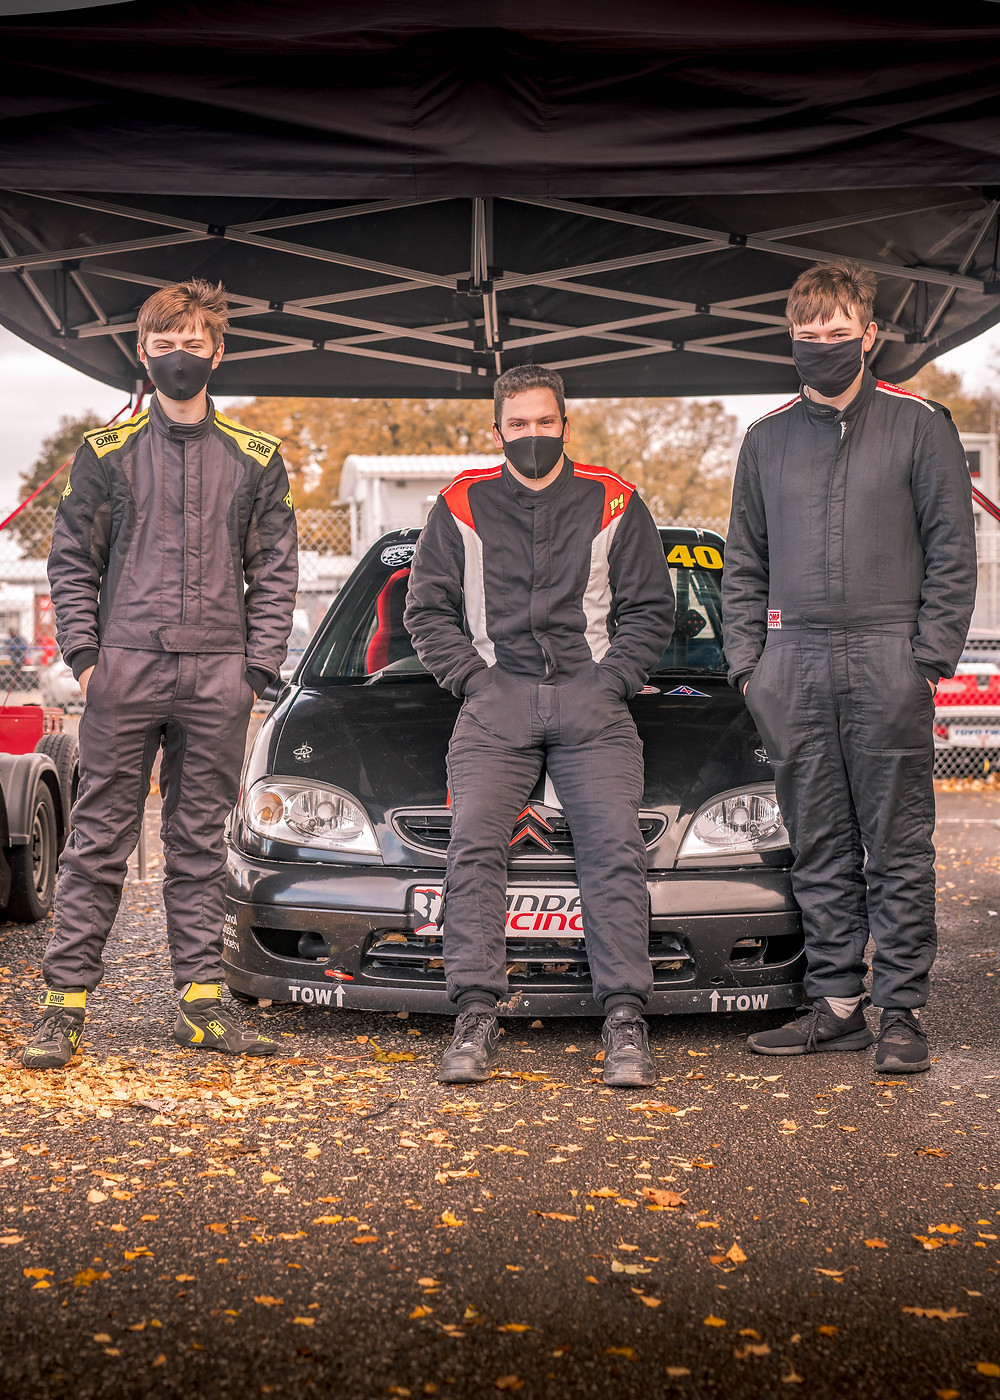 Matt Cripps | Citroen Saxo | Oulton Park